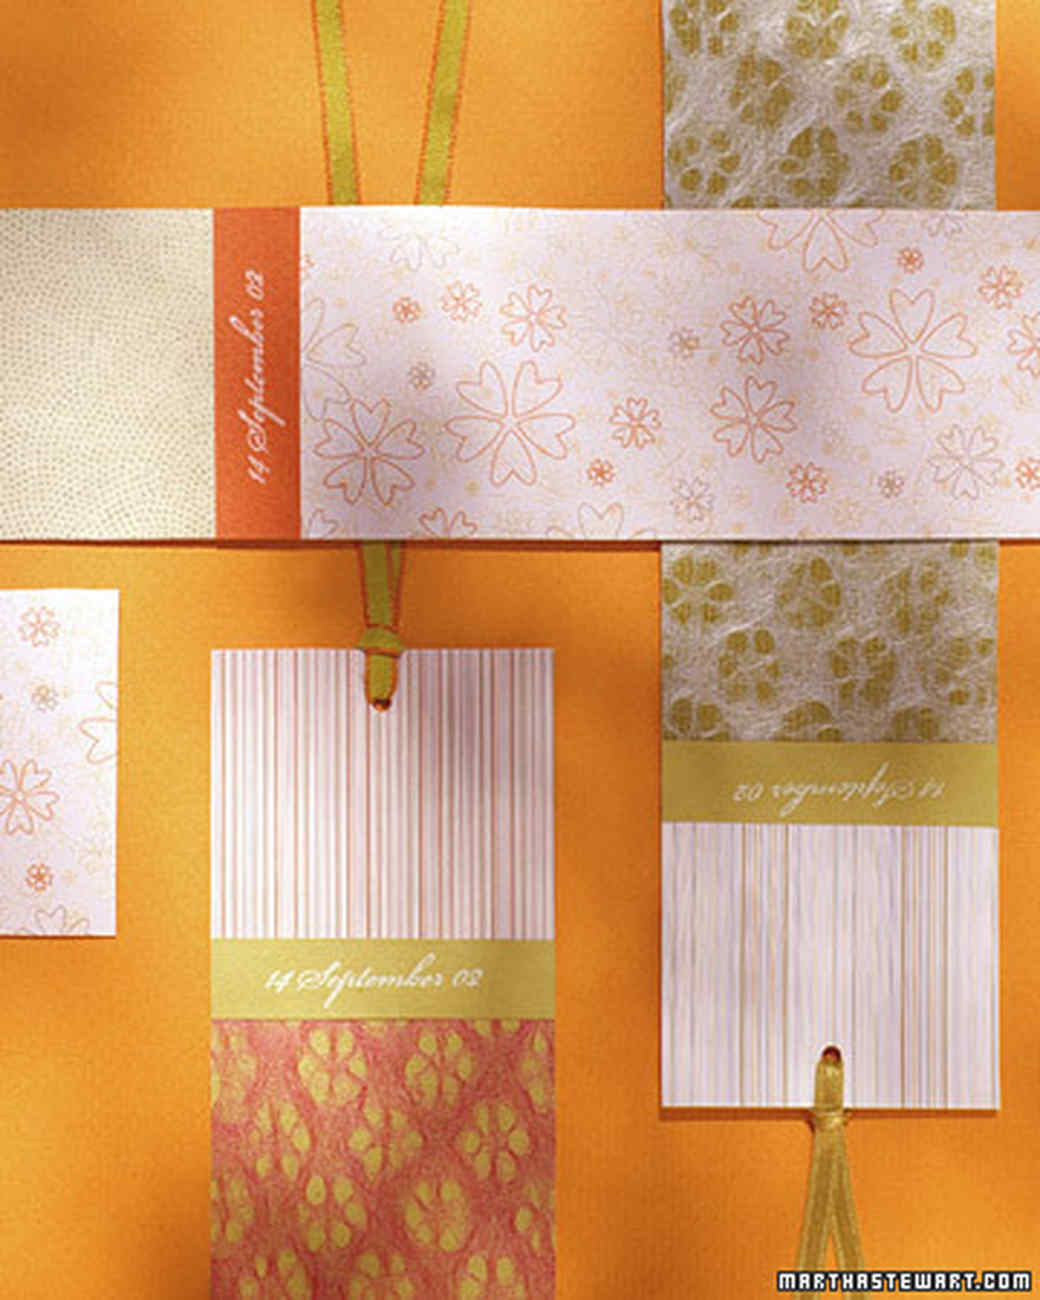 Patterned Bookmarks